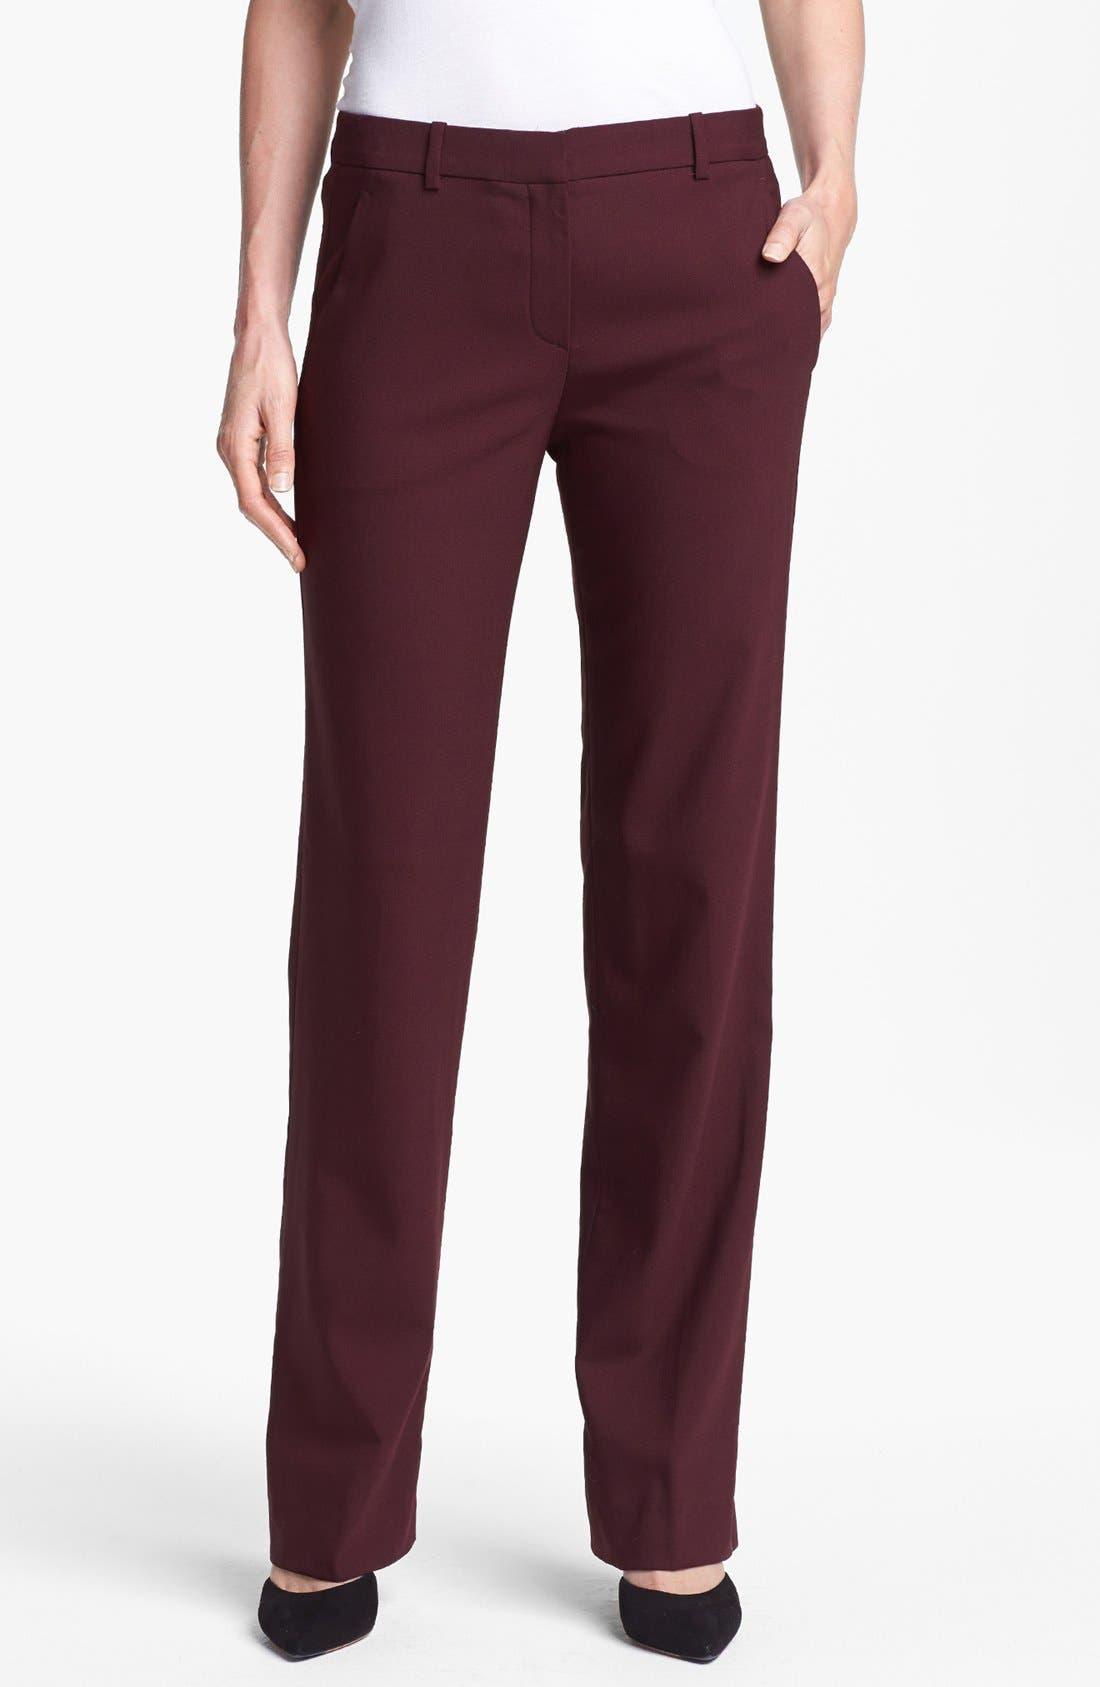 Main Image - Theory 'Avano' Stretch Wool Pants